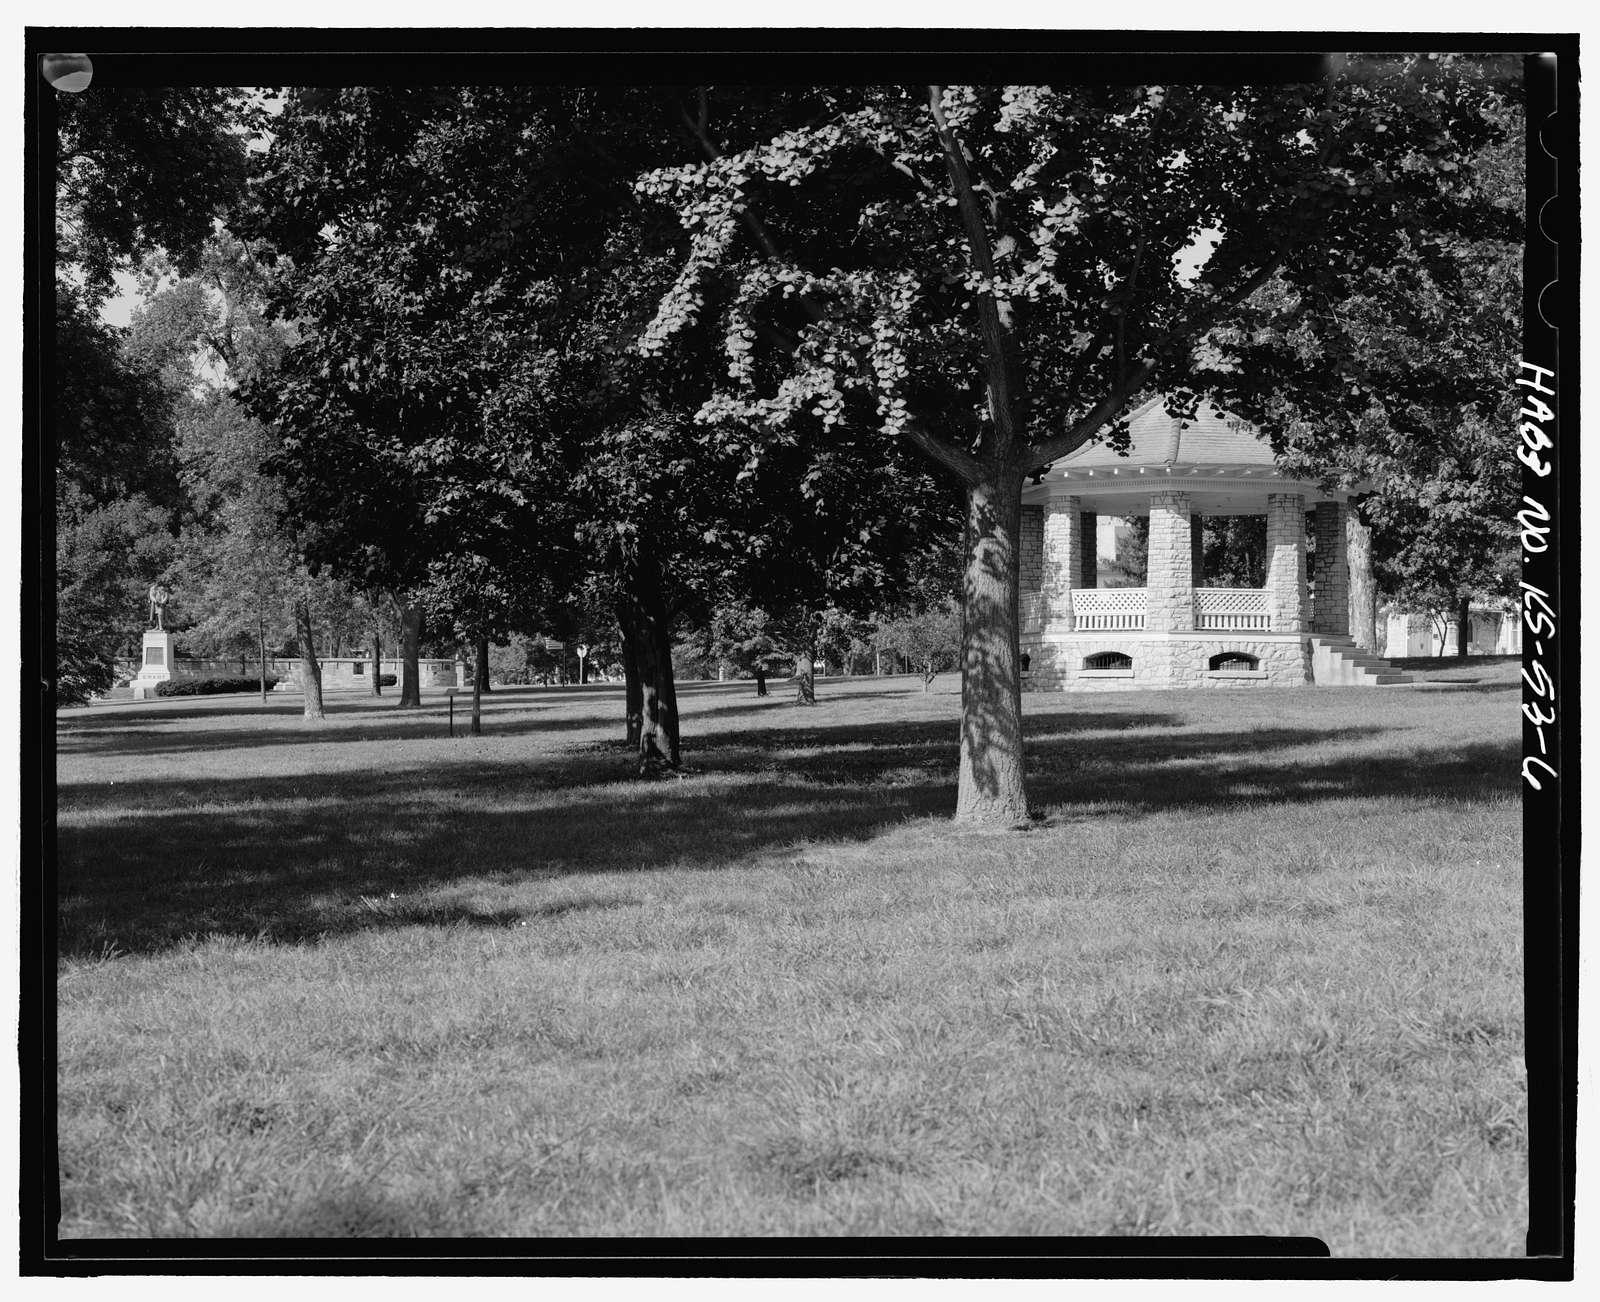 Fort Leavenworth, Metropolitan Avenue & Seventh Street, Leavenworth, Leavenworth County, KS